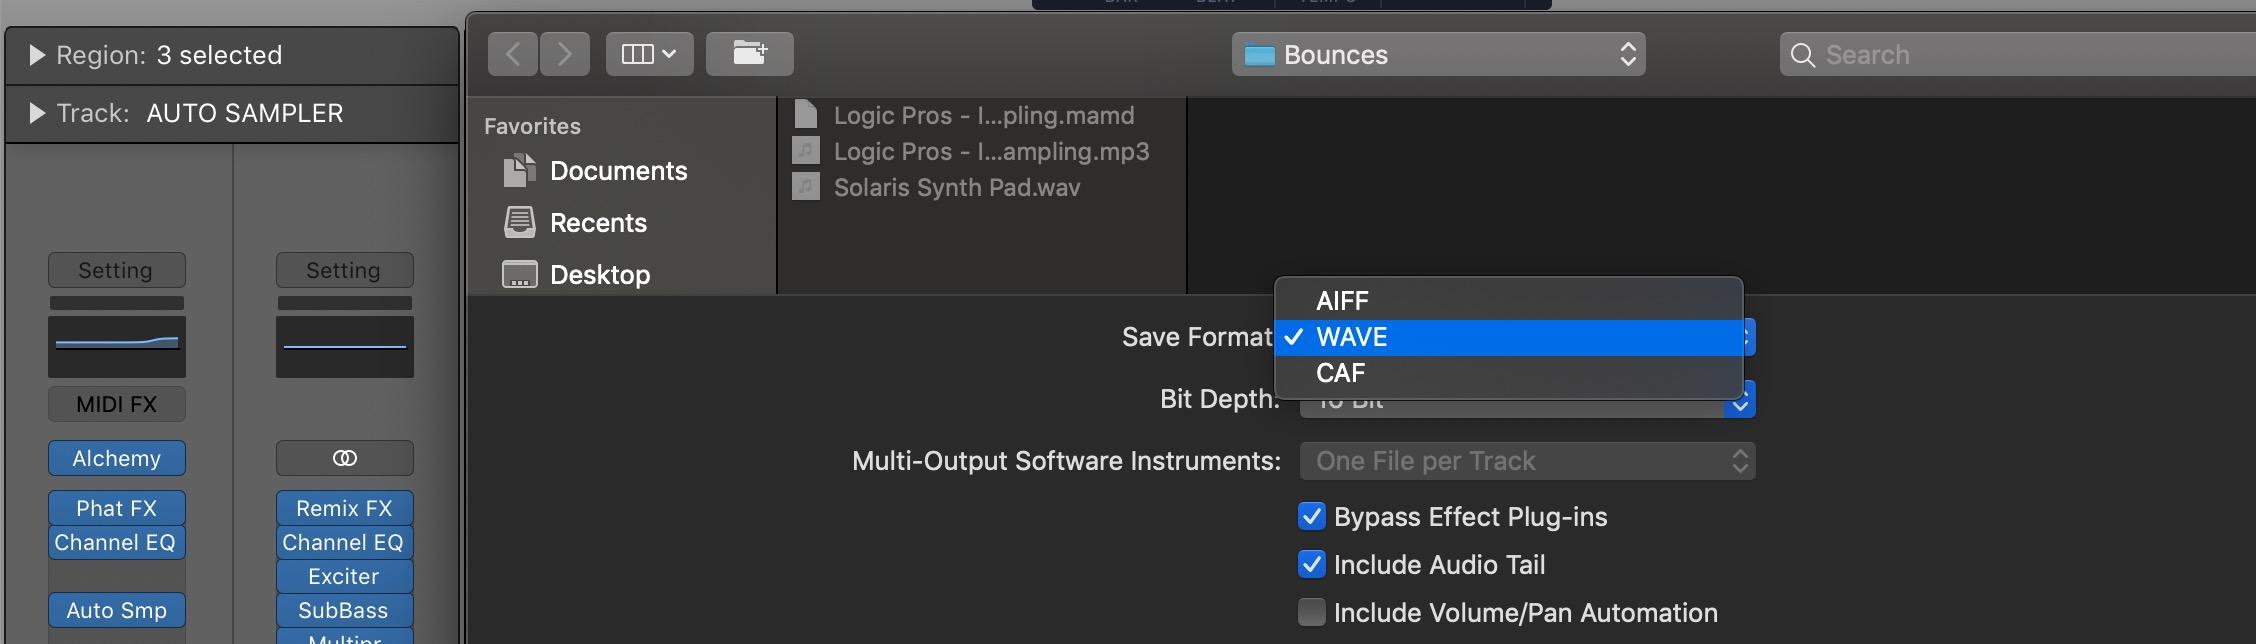 Drag and drop export file format - Logic Pro X